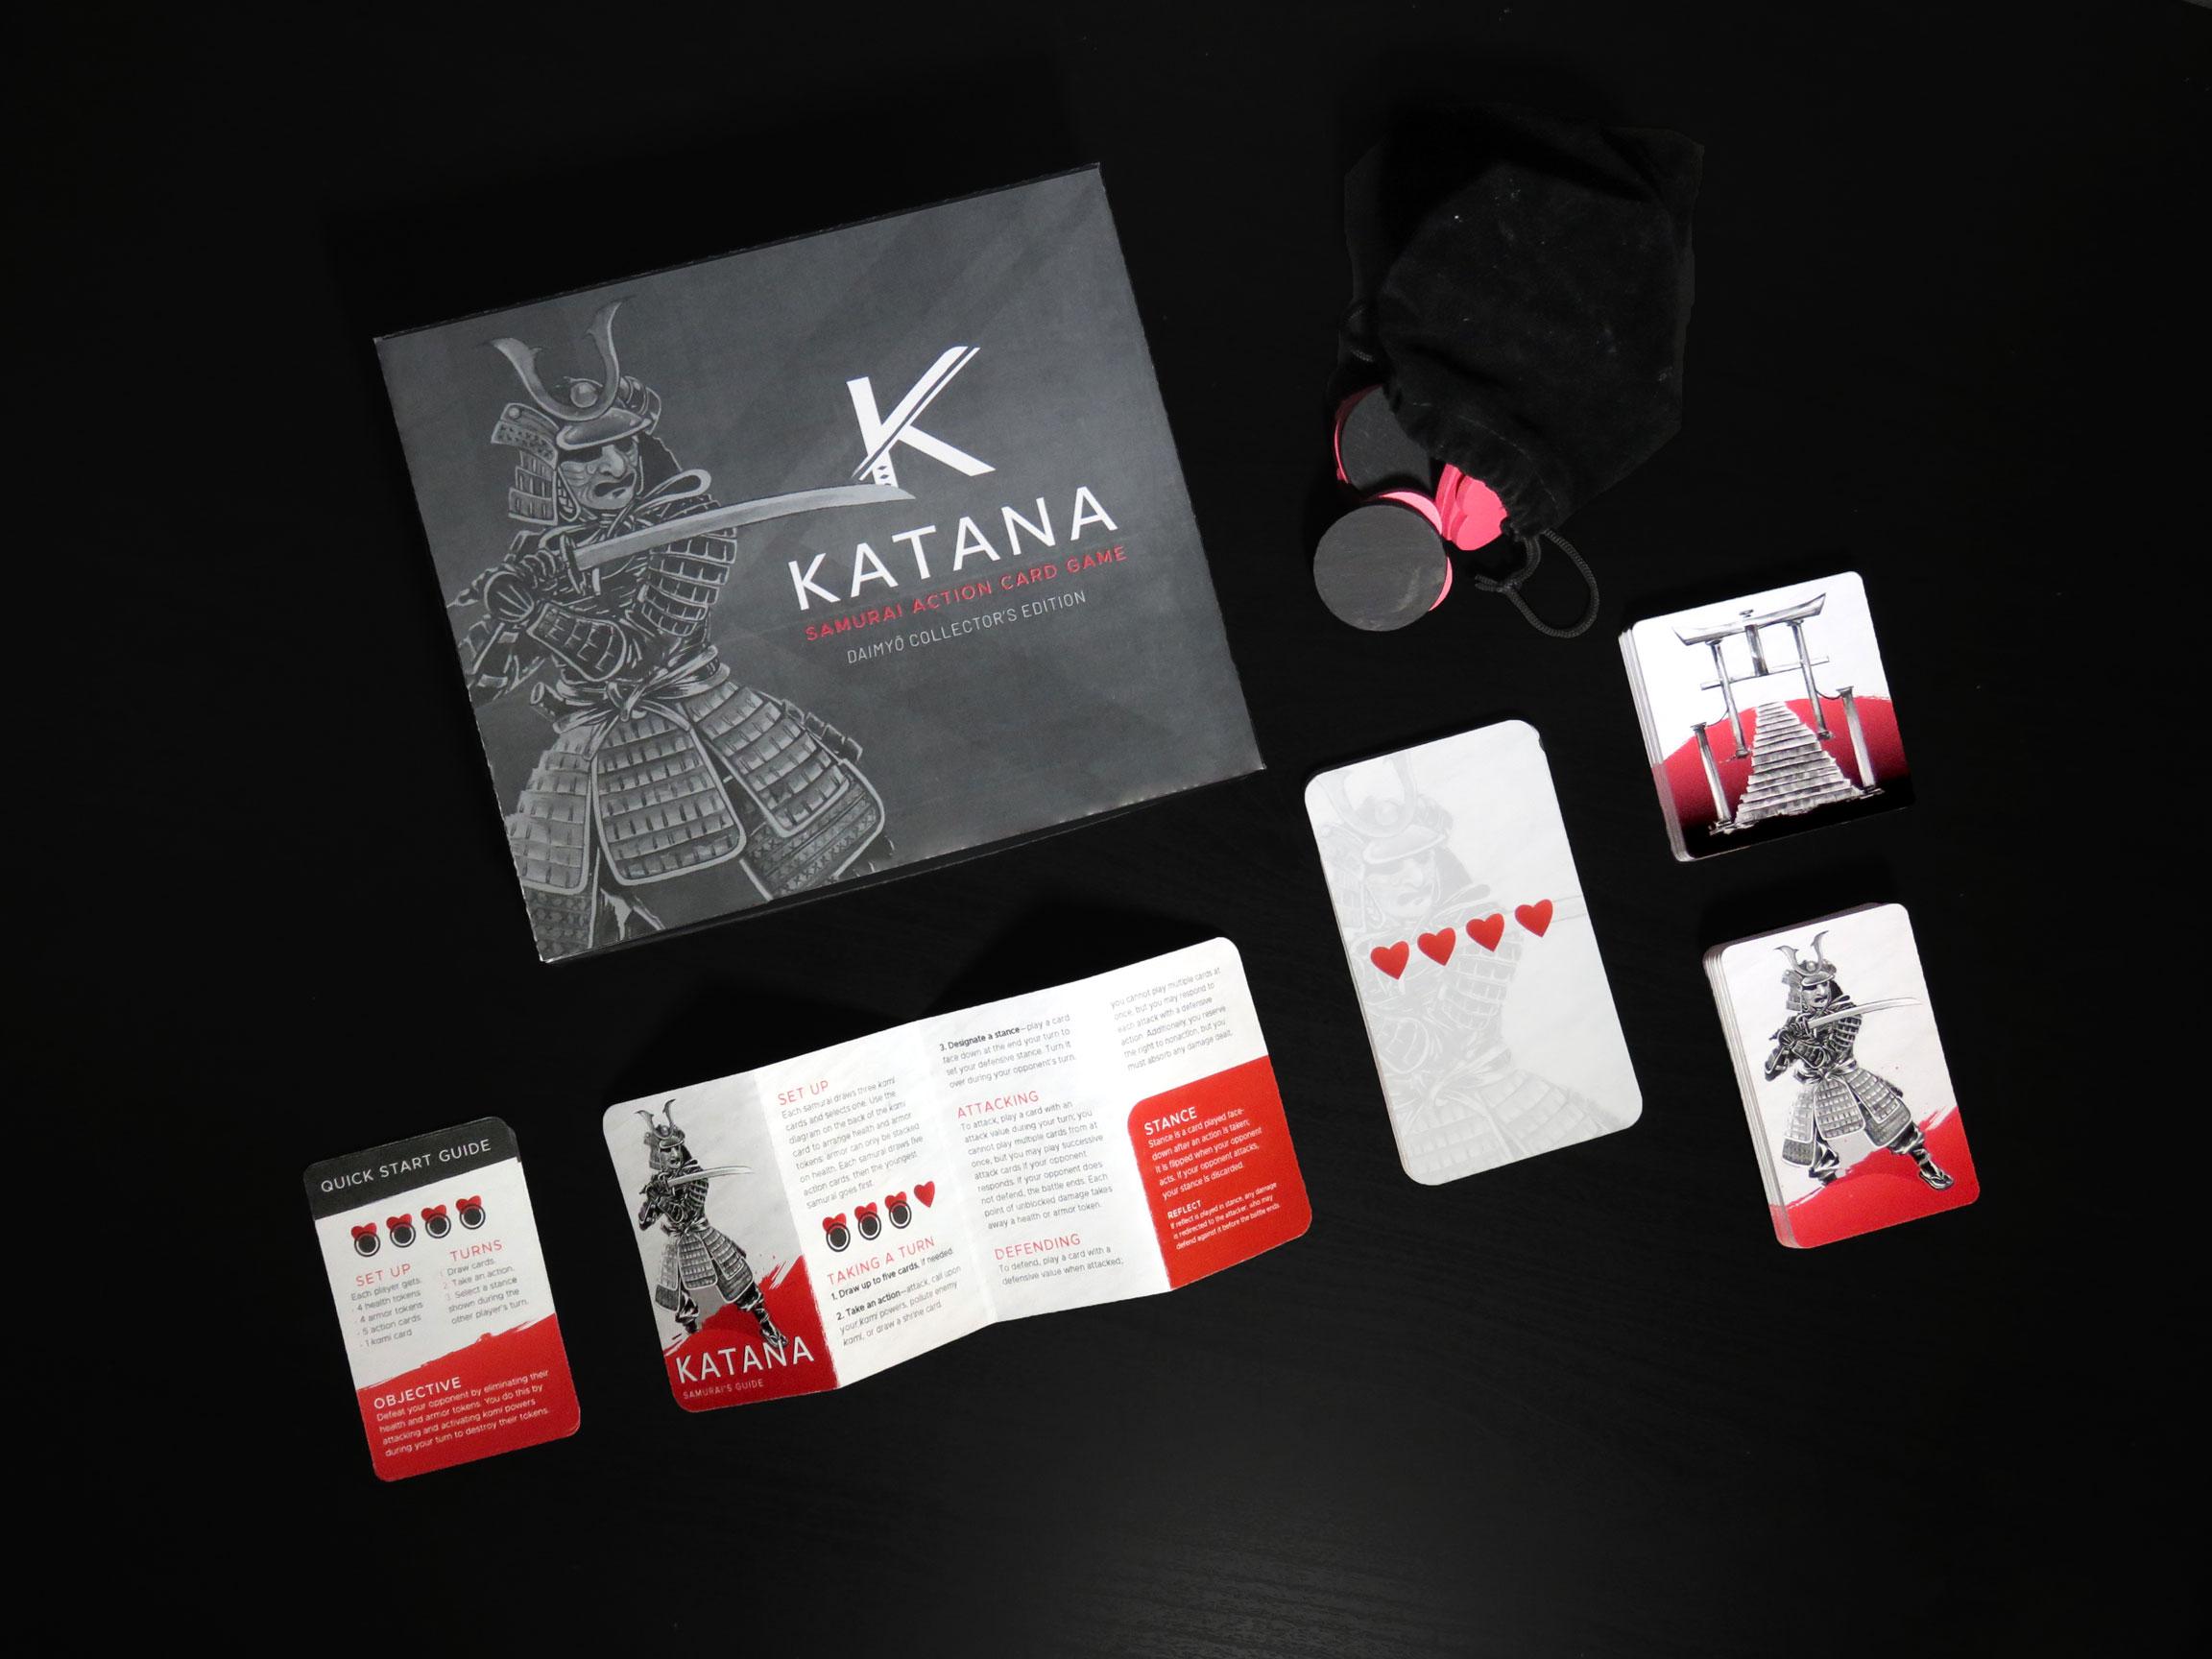 Katana—Daimyō Collector's Edition  includes: an Action deck (50 cards),  Kami  deck (12 cards), Shrine deck (24 cards), 10 Health tokens, 12 Armor tokens, Velvet Drawstring Token Bag Samurai's Guide, Quick Start Guide, Clamshell box